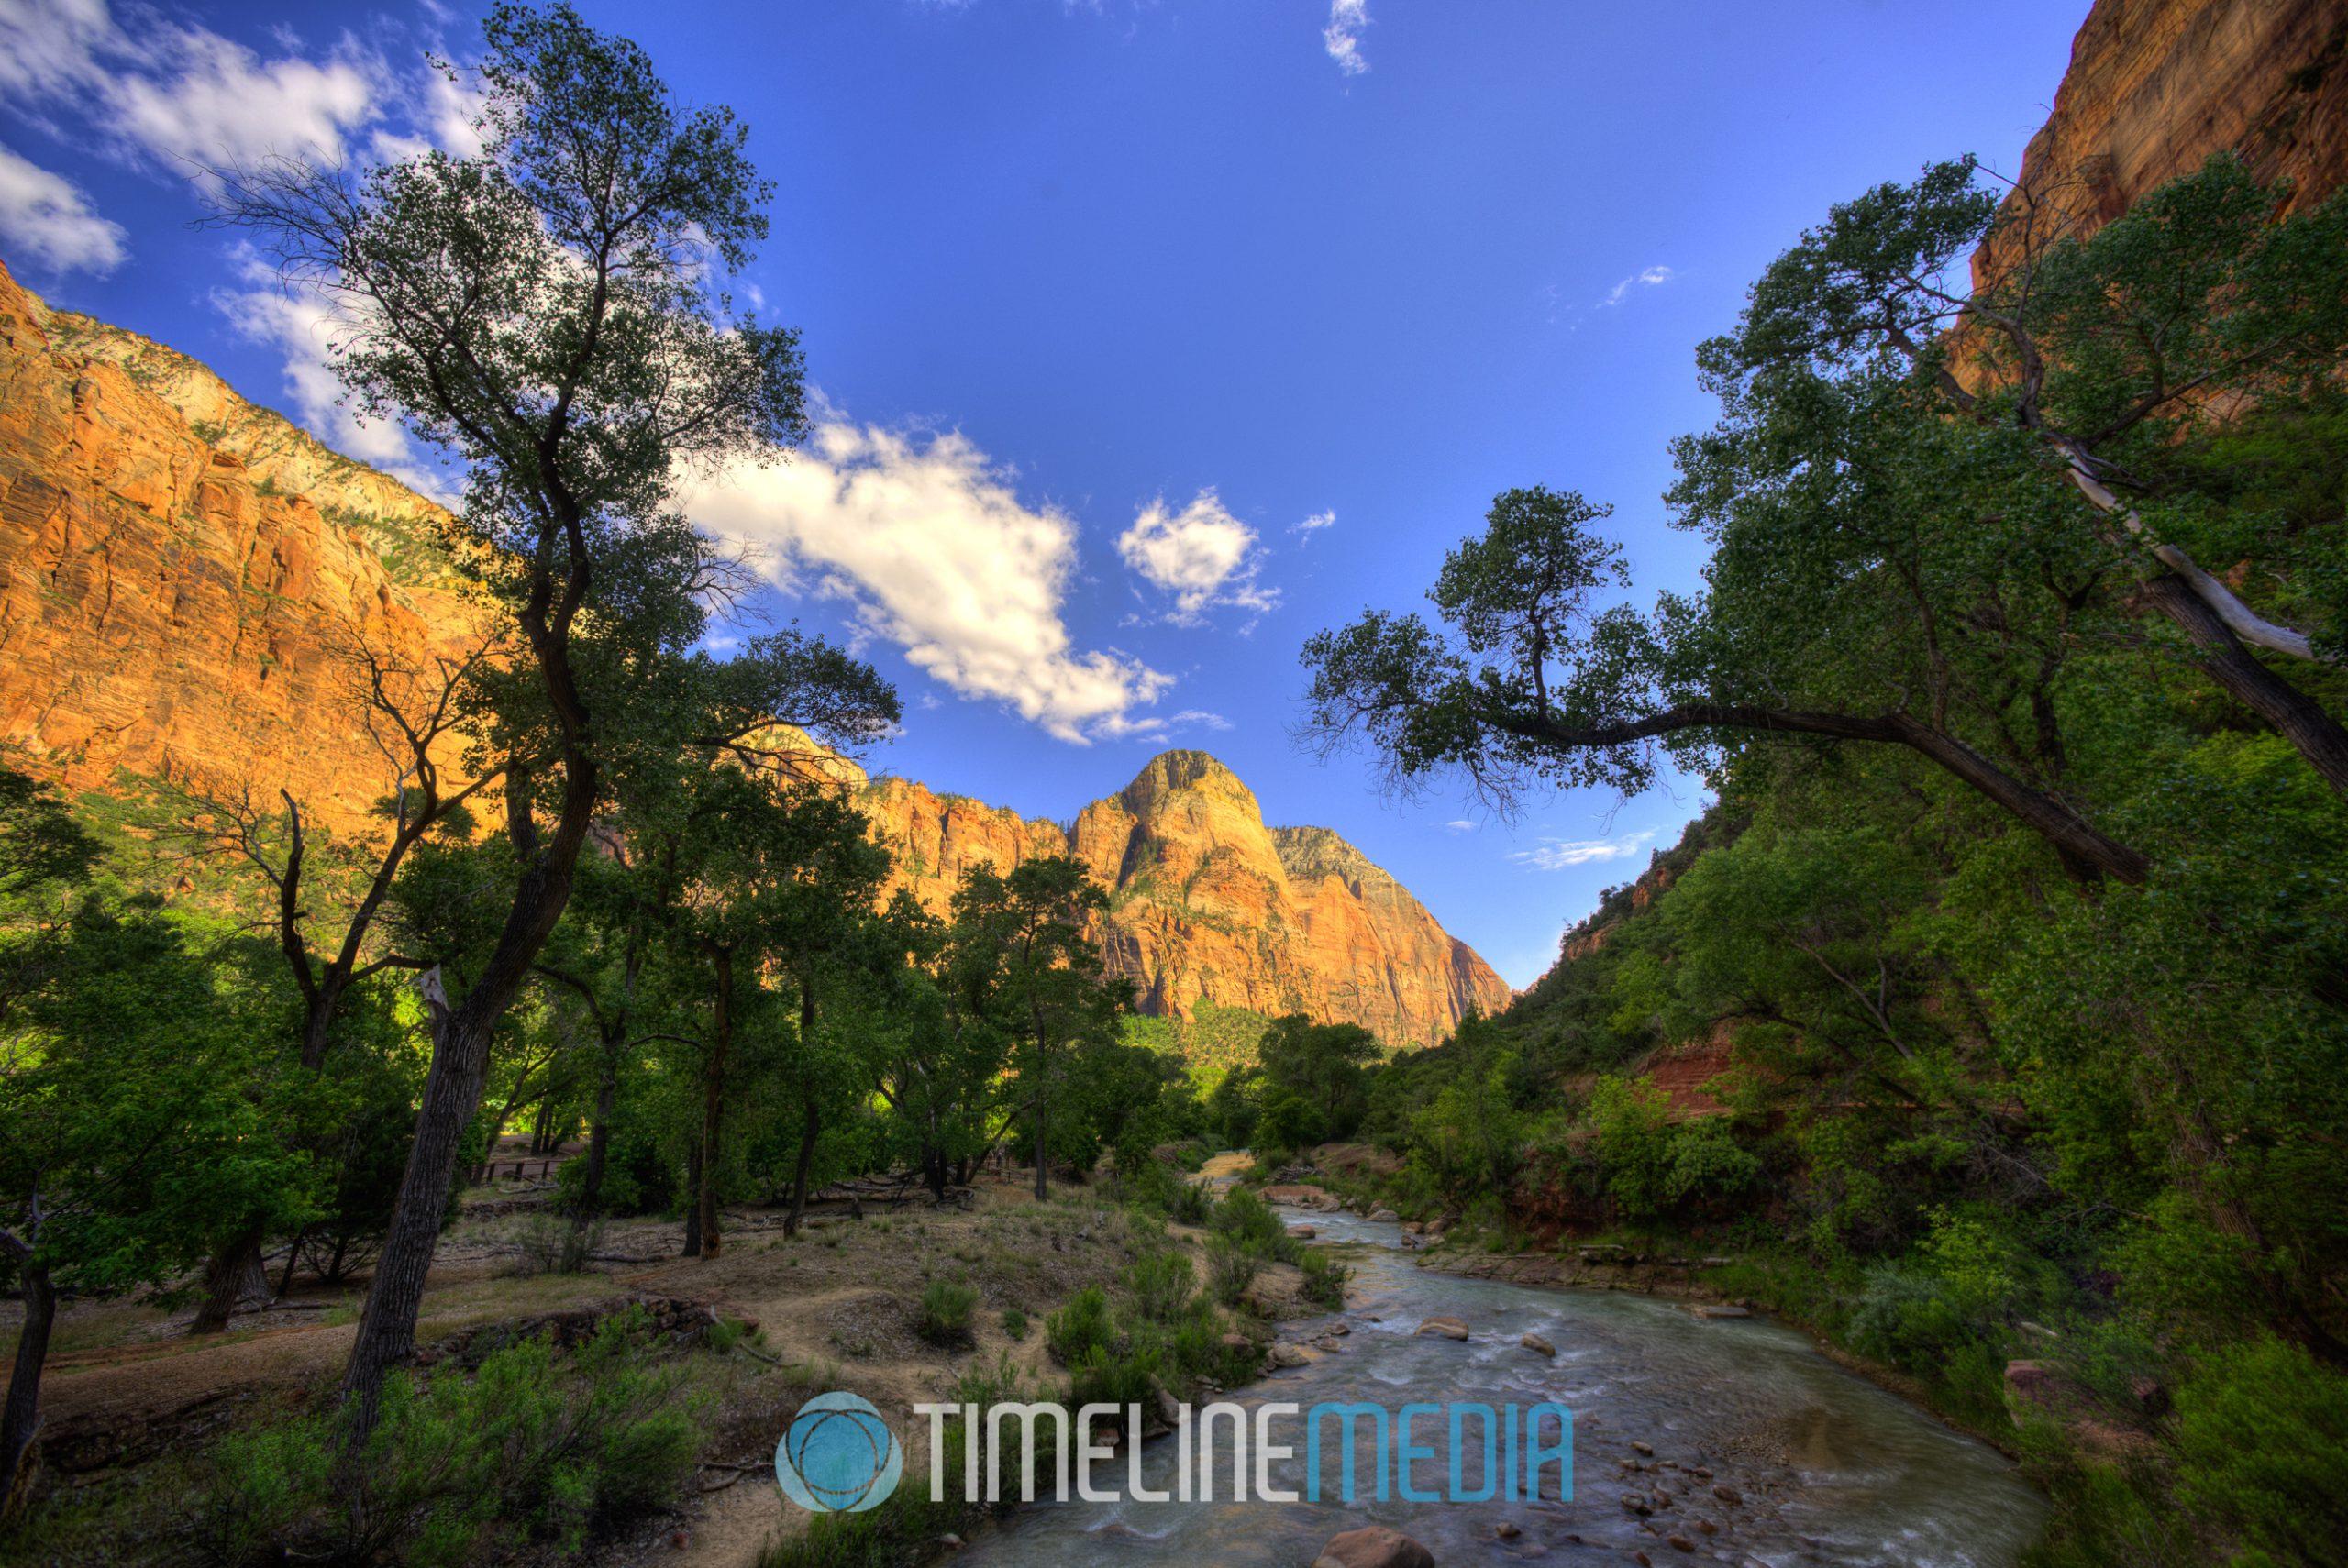 Virgin River through the valley ©TimeLine Media